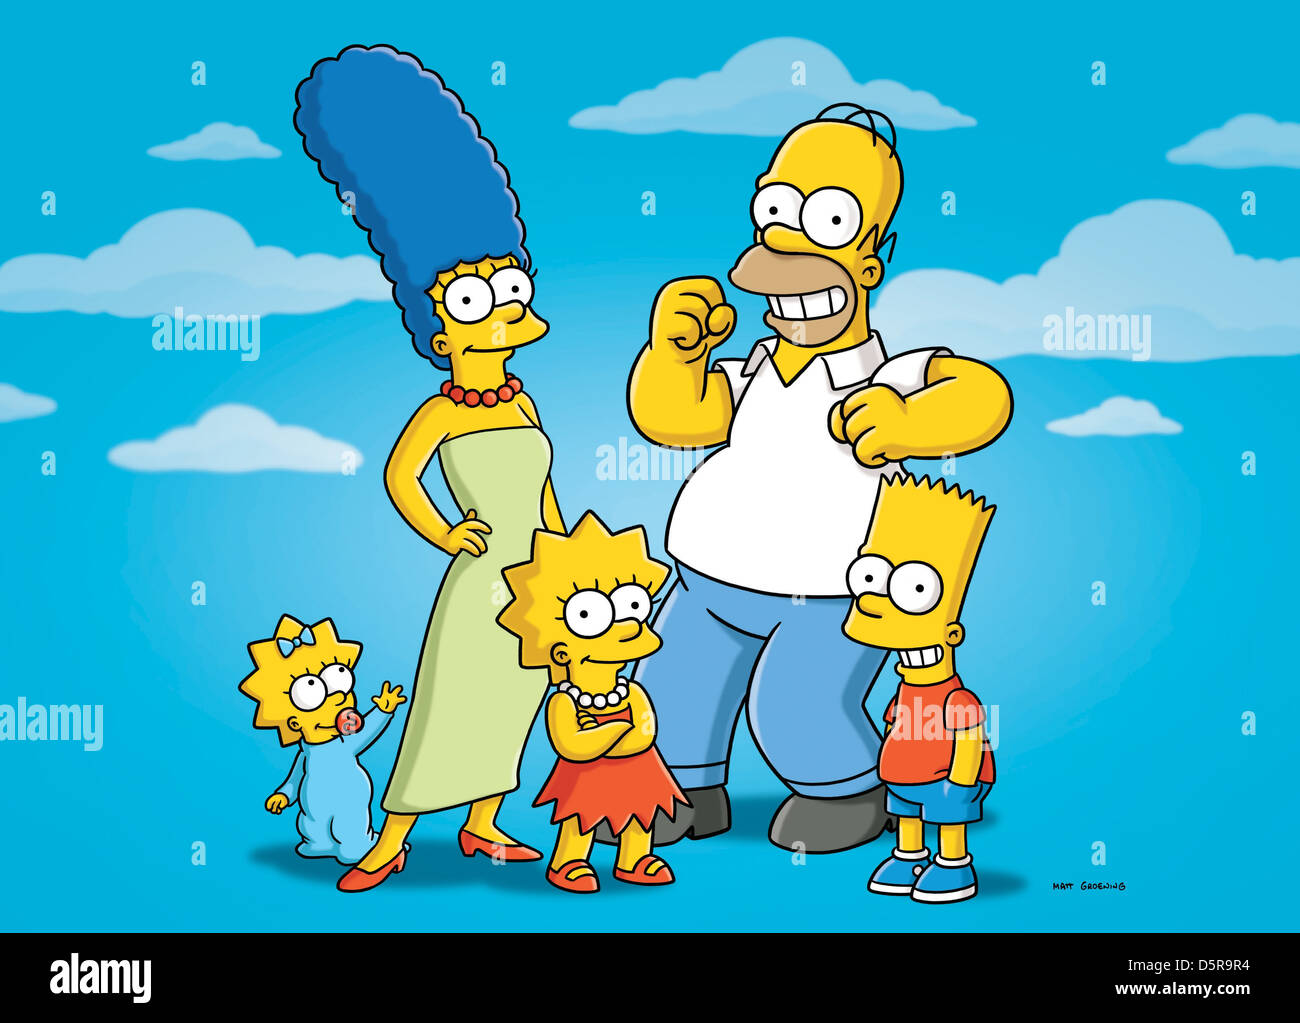 Maggie simpson marge simpson lisa simpson homer simpson et bart simpson les simpson saison 21 - Marge simpson et bart ...